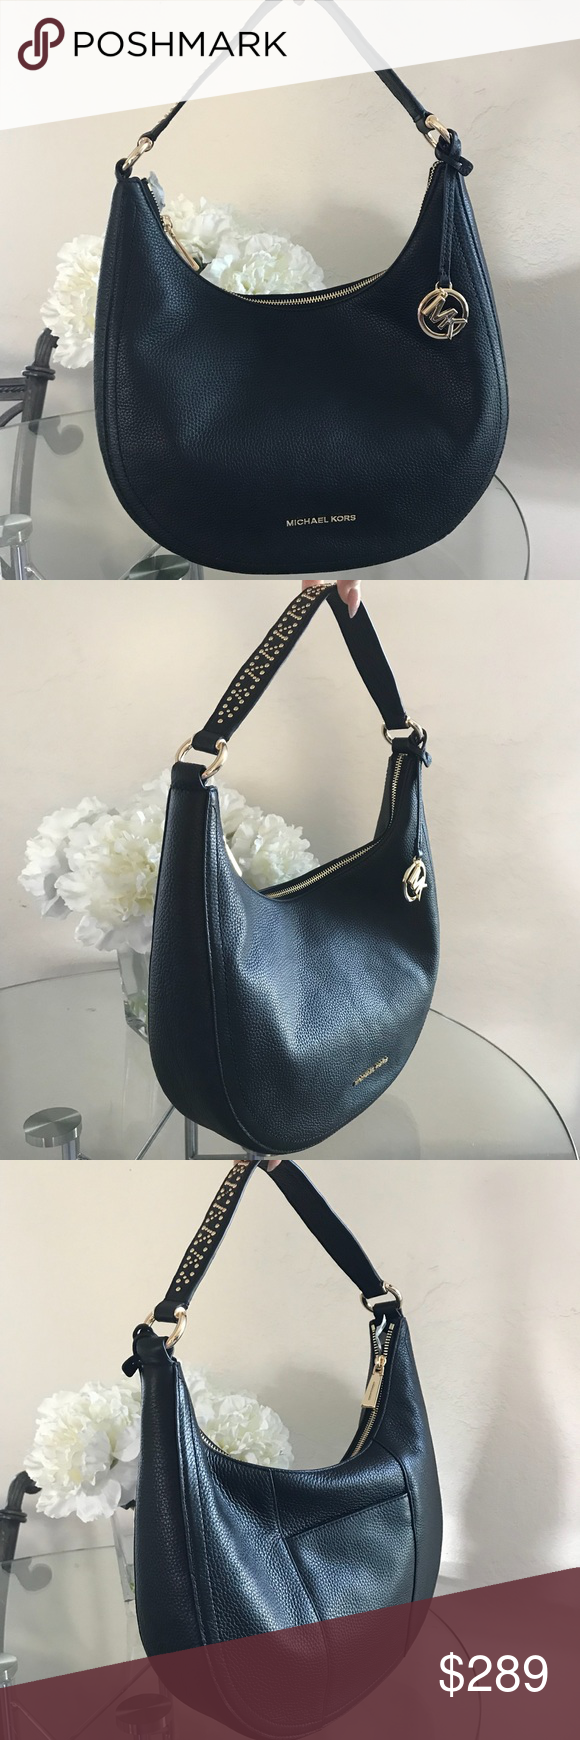 7b8f0b2271a2 Michael Kors Lydia Black Shoulder Bag Purse Brand New Michael Kors Black  Genuine Leather Lydia Medium Shoulder Bag Purse Tote Satchel.